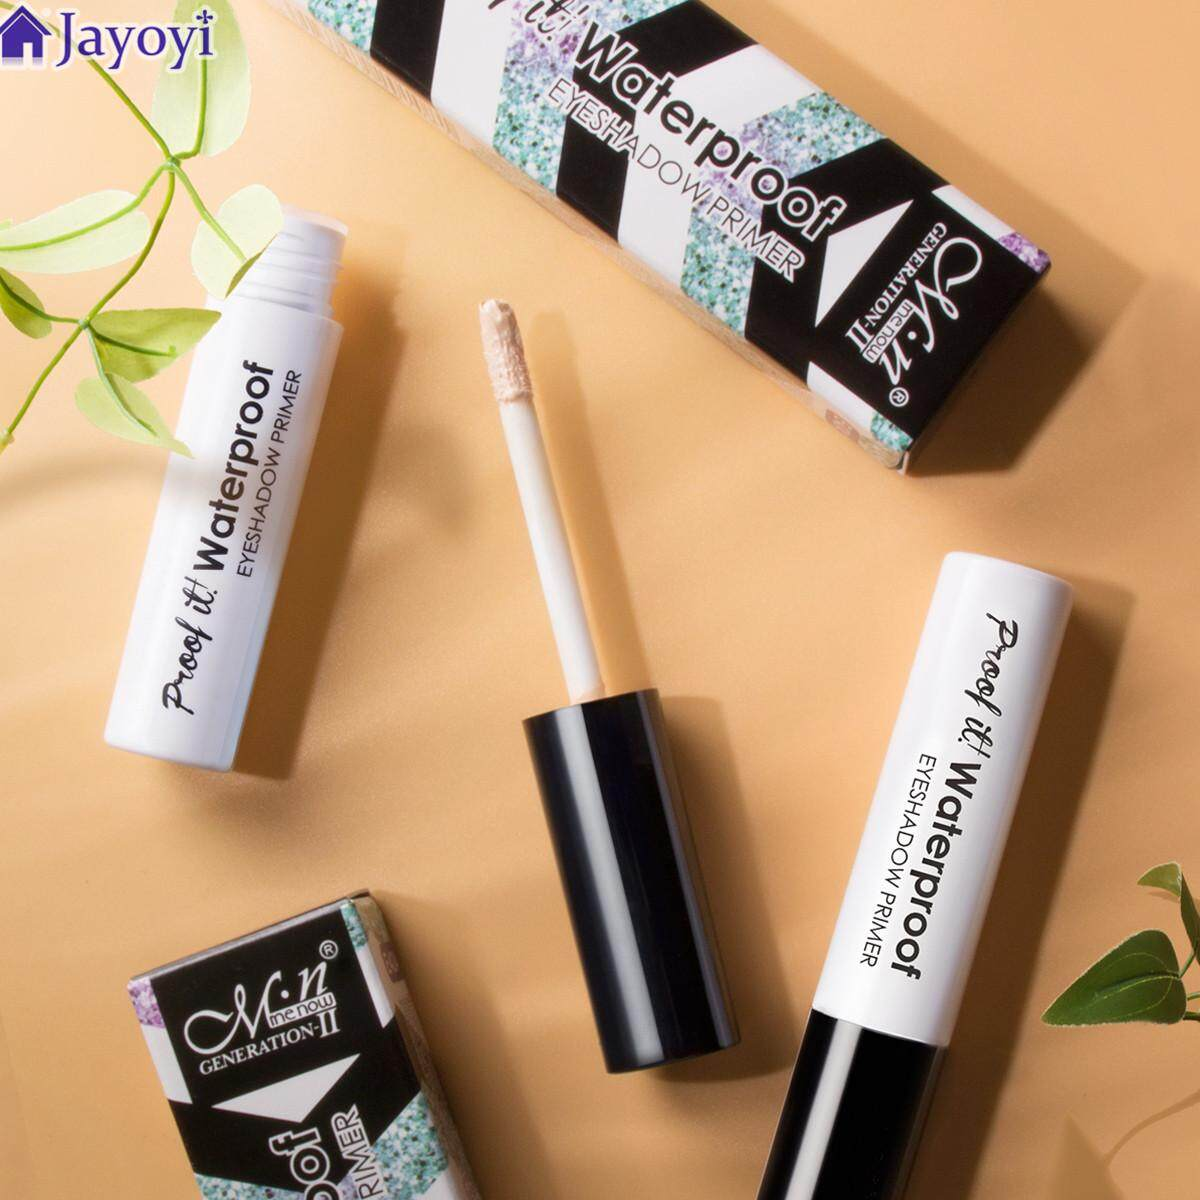 Jayoyi Professional Natural Eye Primer Eye Base Long Lasting Professional Makeup Philippines